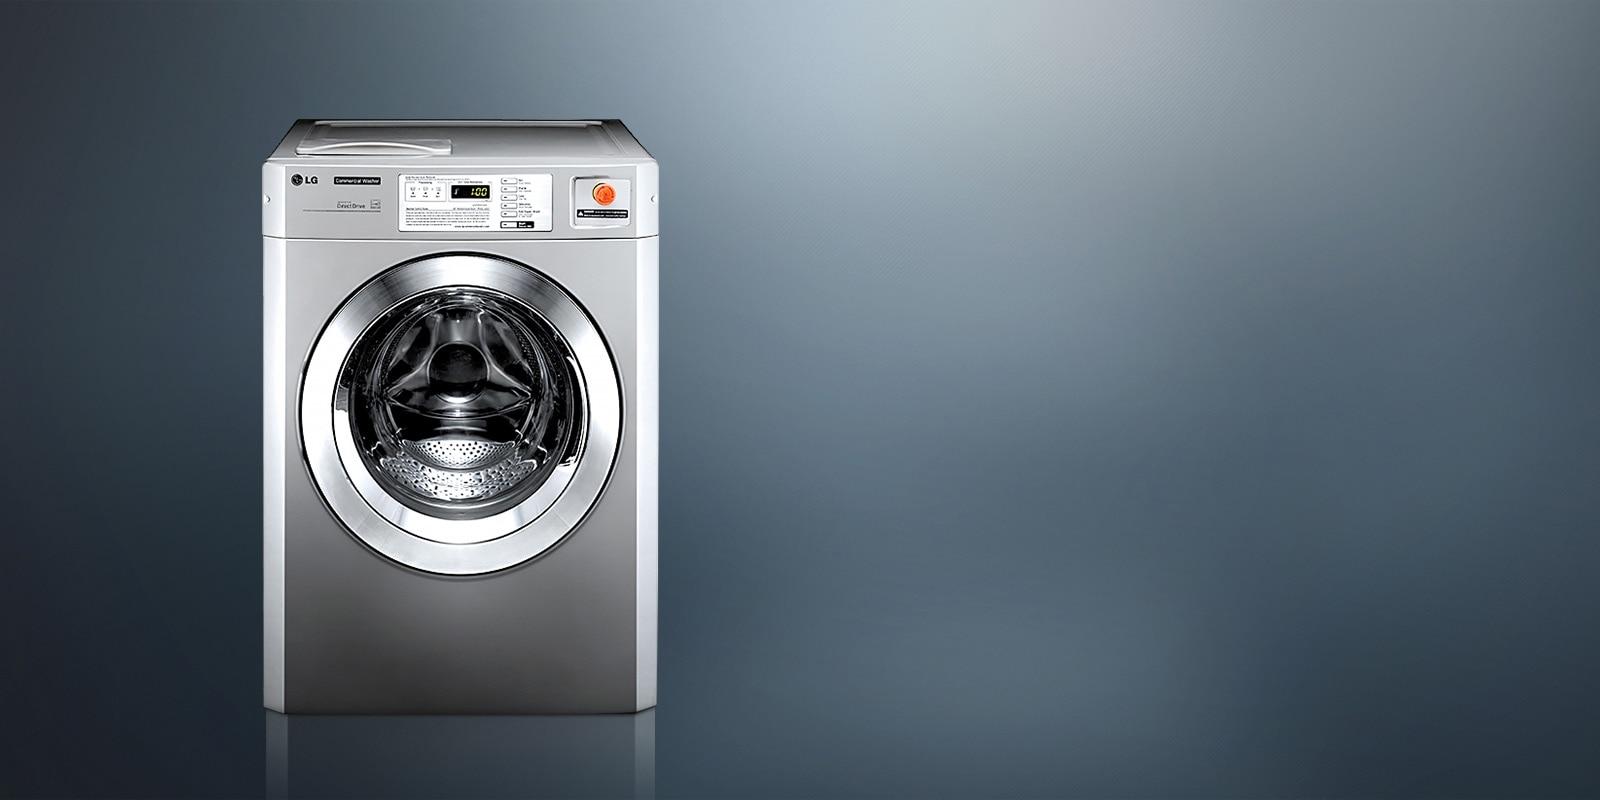 Titan C Washing Machine Commercial Laundry Equipment Lg